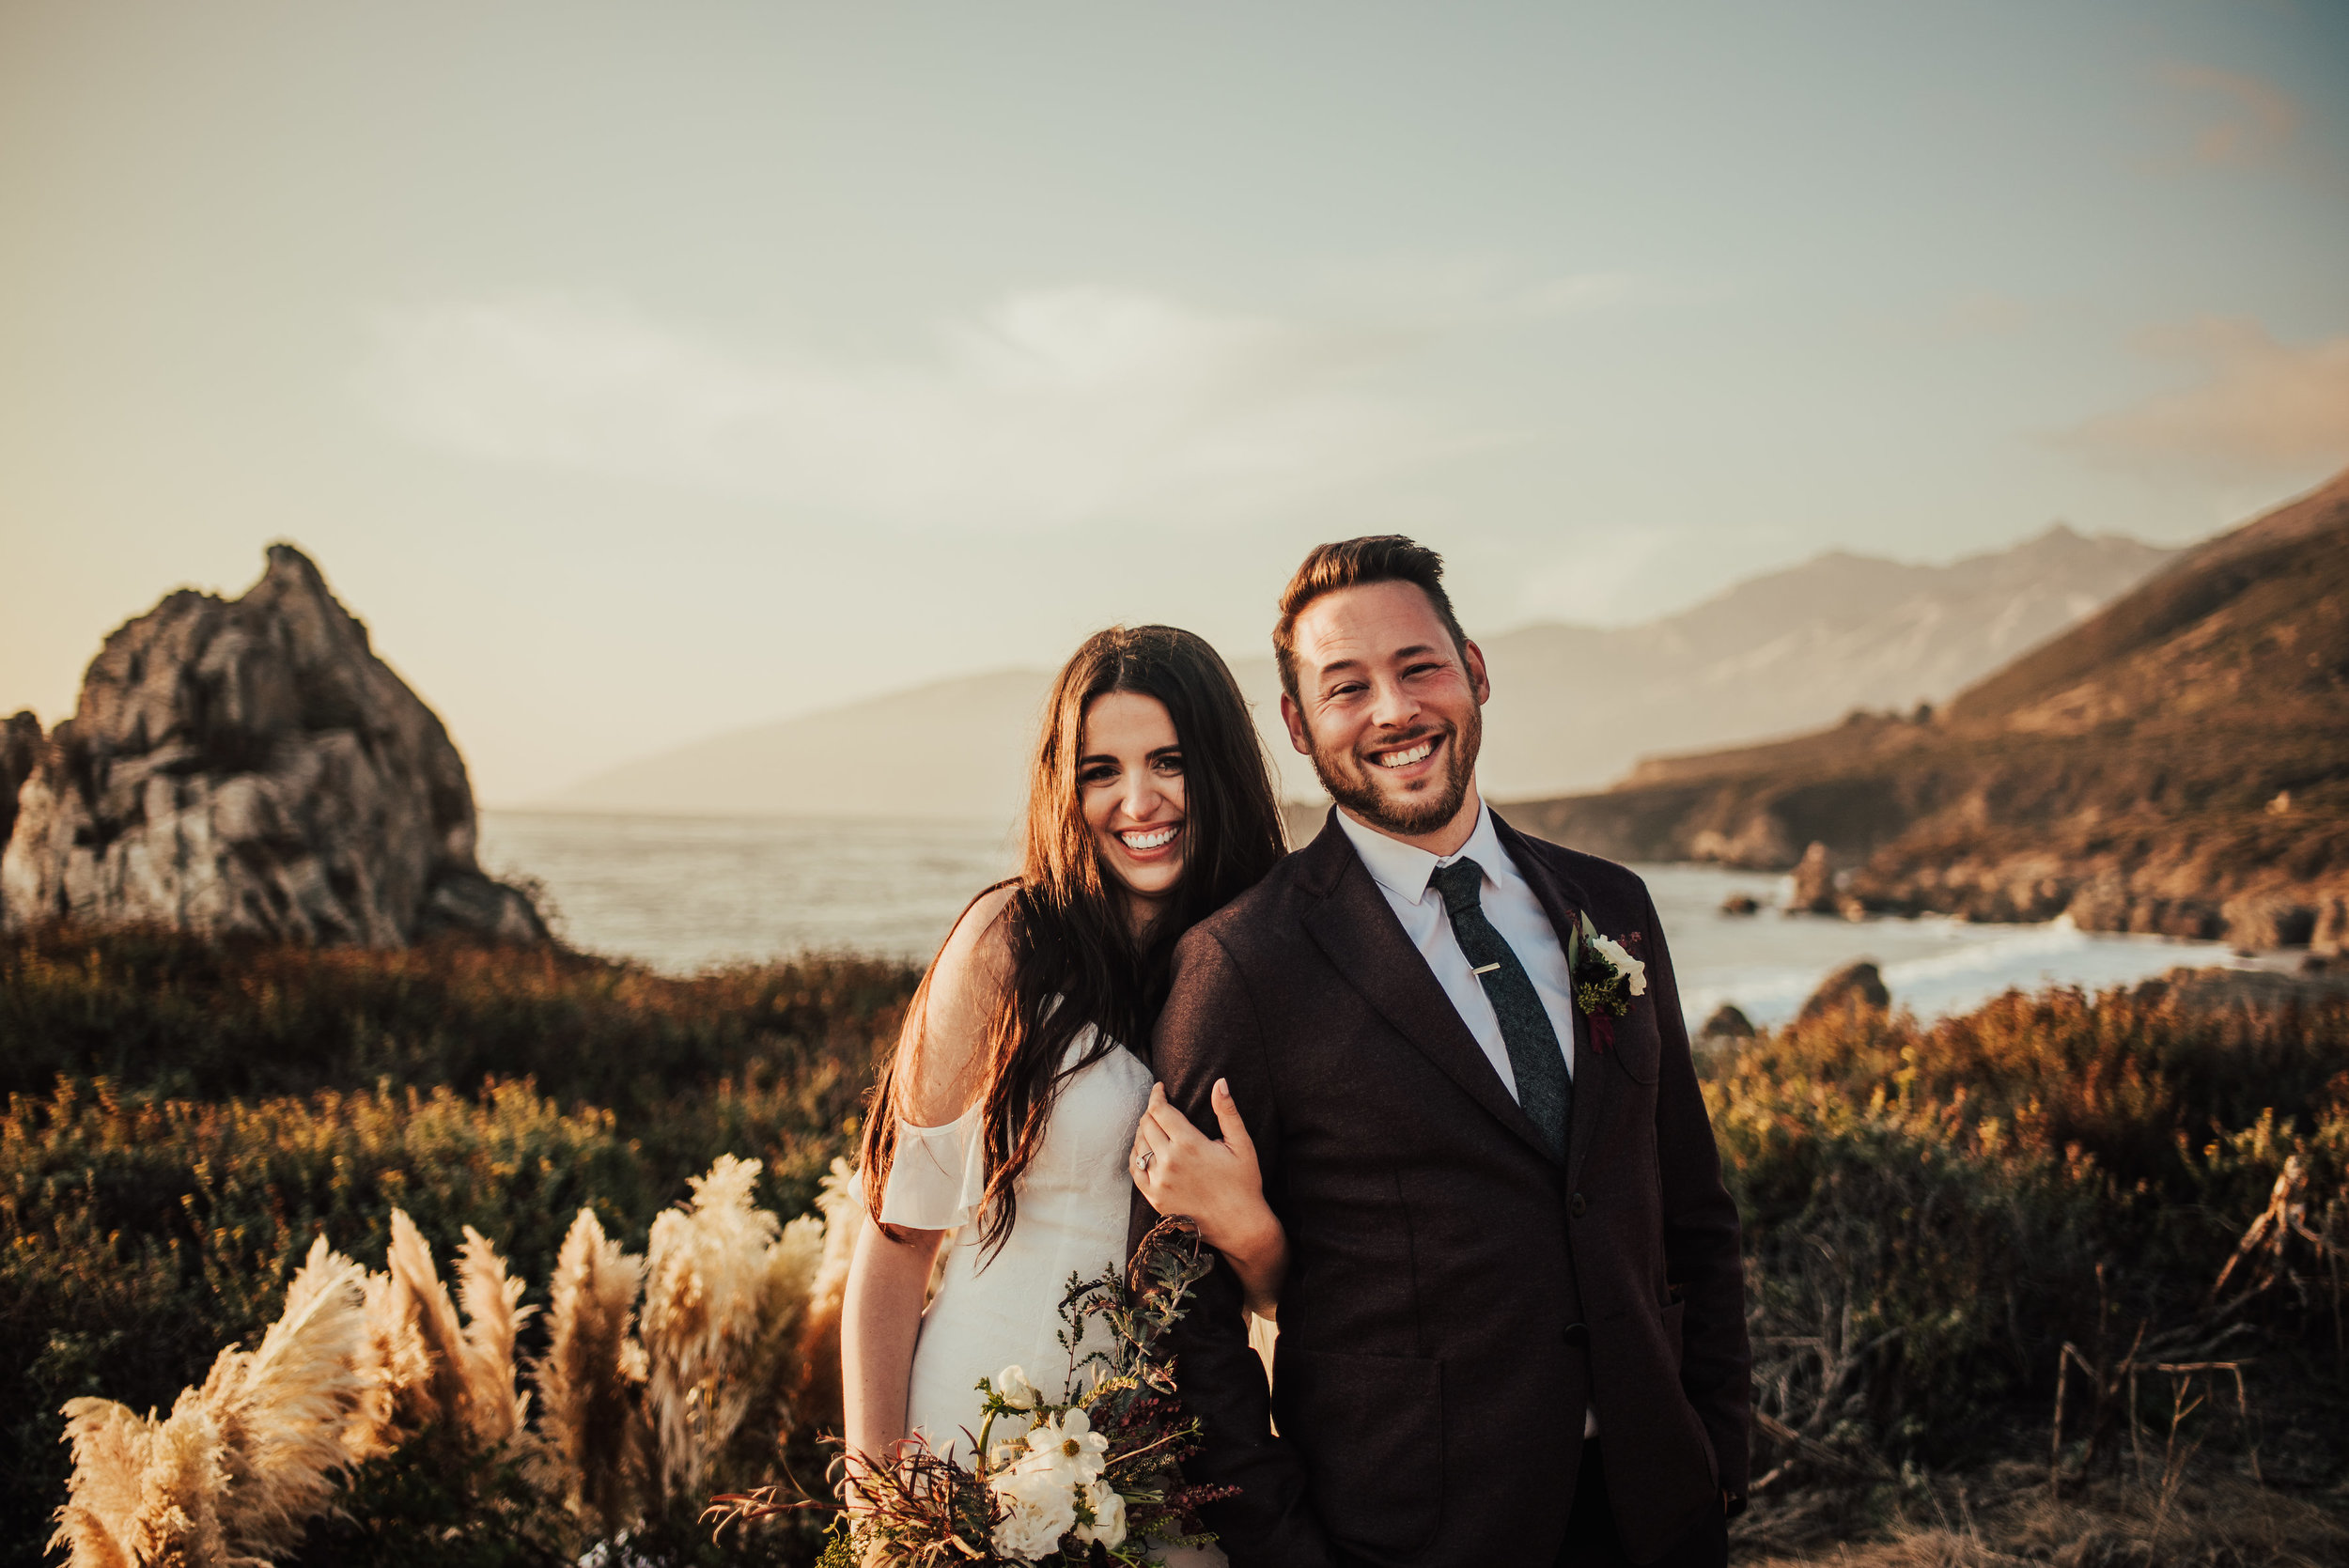 Natalie & Rocky - Big Sur, CAVenue: The coast of Big SurPhotographer: Tessa Tadlock